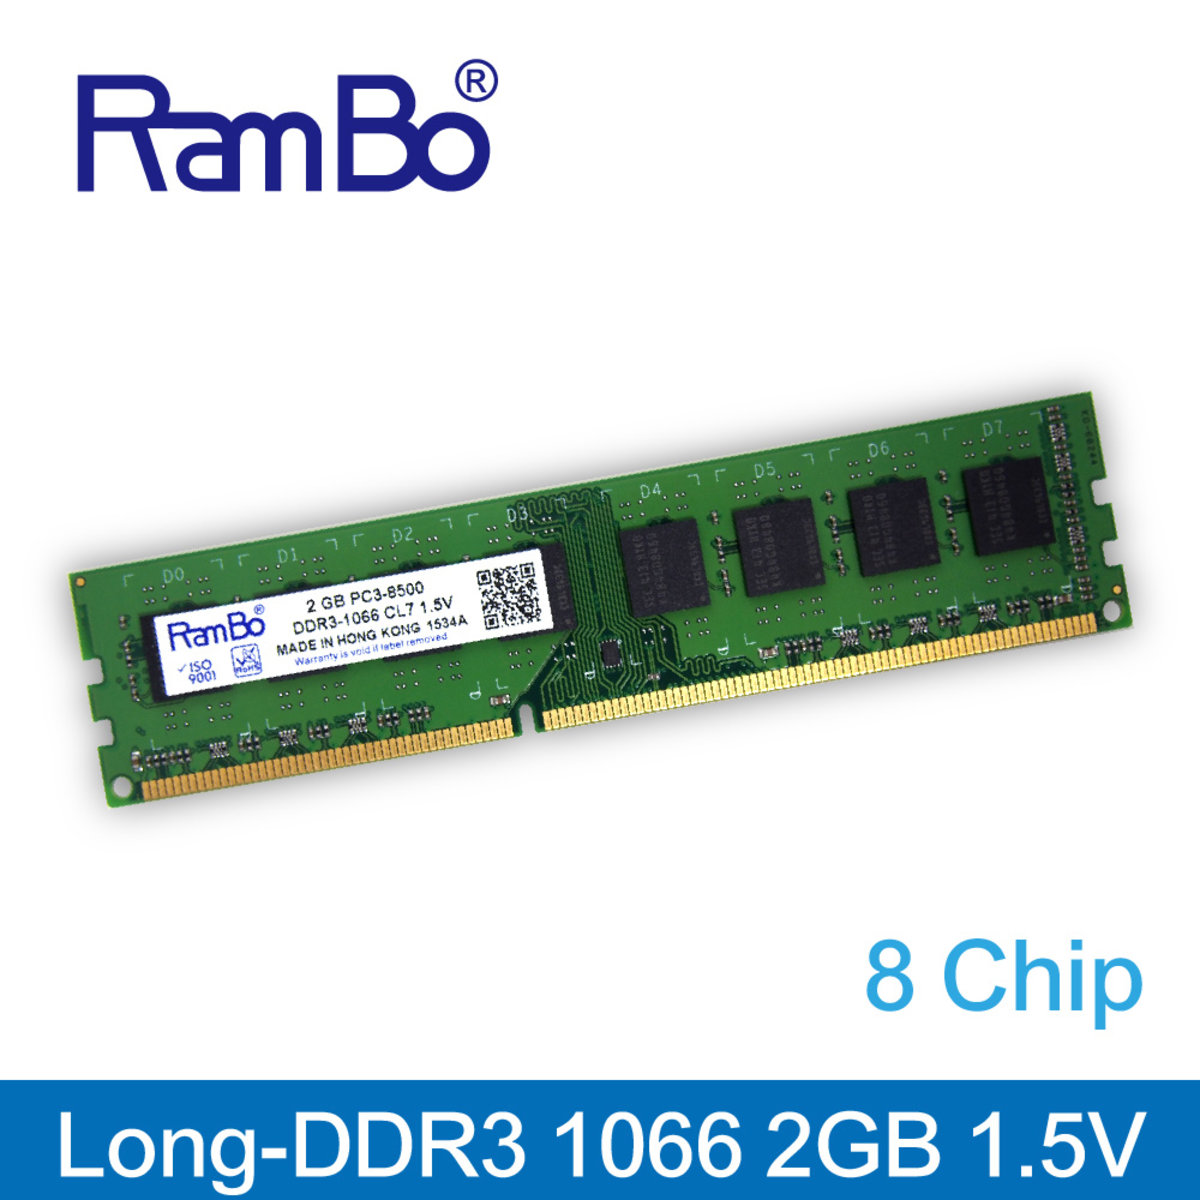 2GB DDR3-1066 PC3-8500 Long DIMM 8-Chip 1.5V Memory for PC Desktop